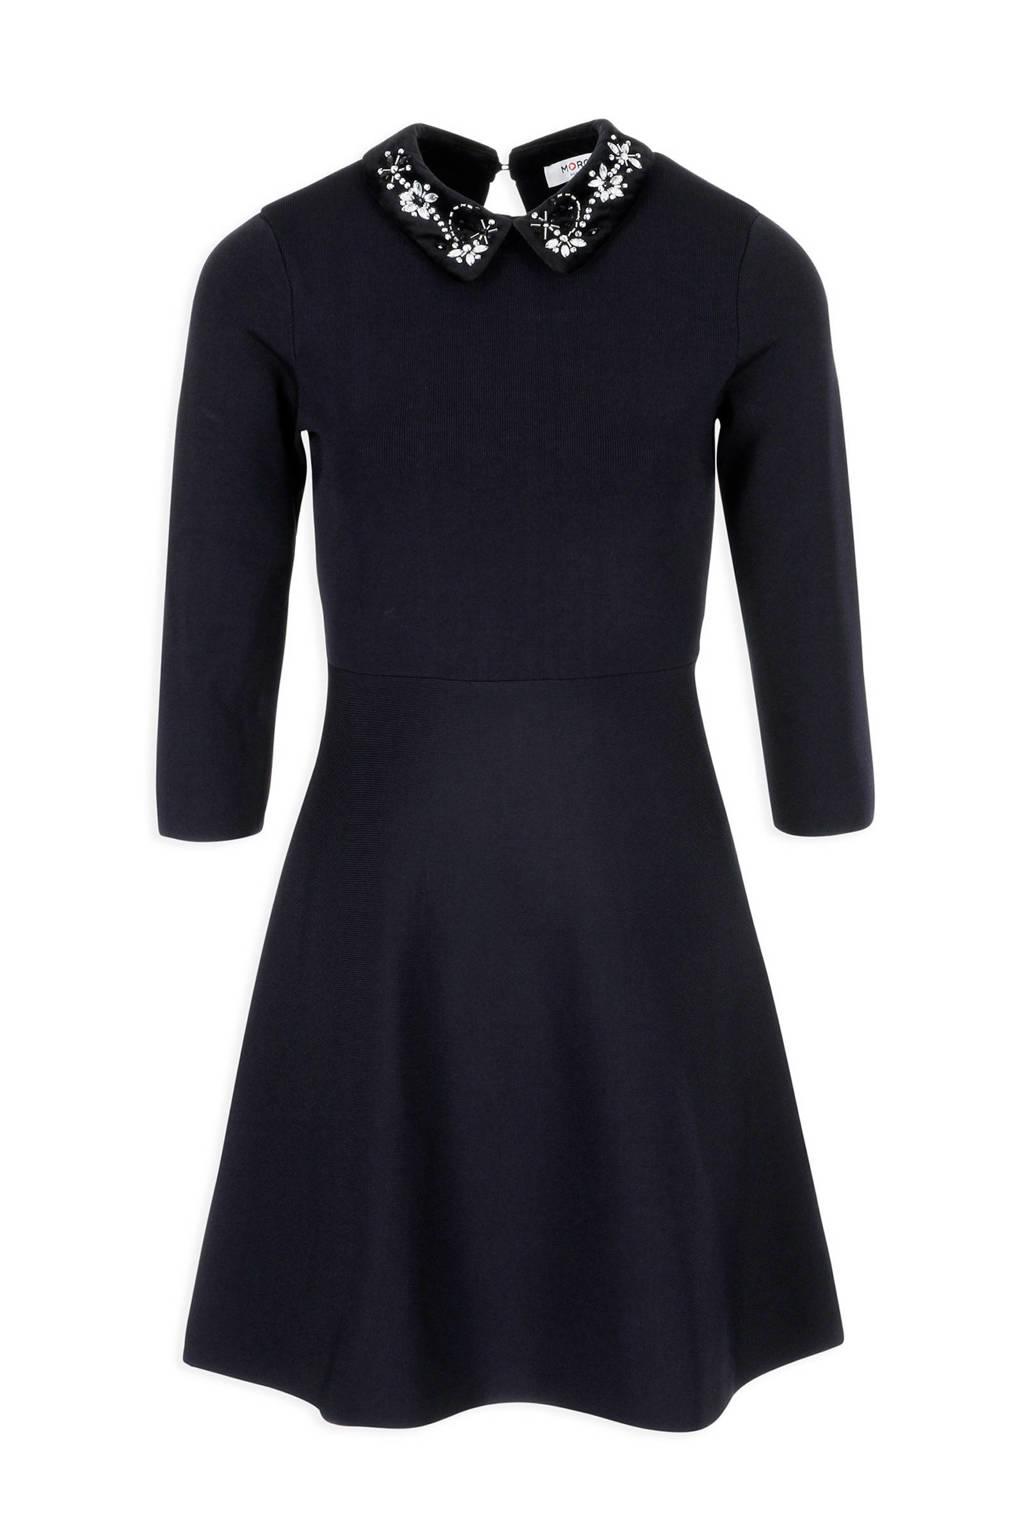 Morgan jurk met pailletten donkerblauw, Marine